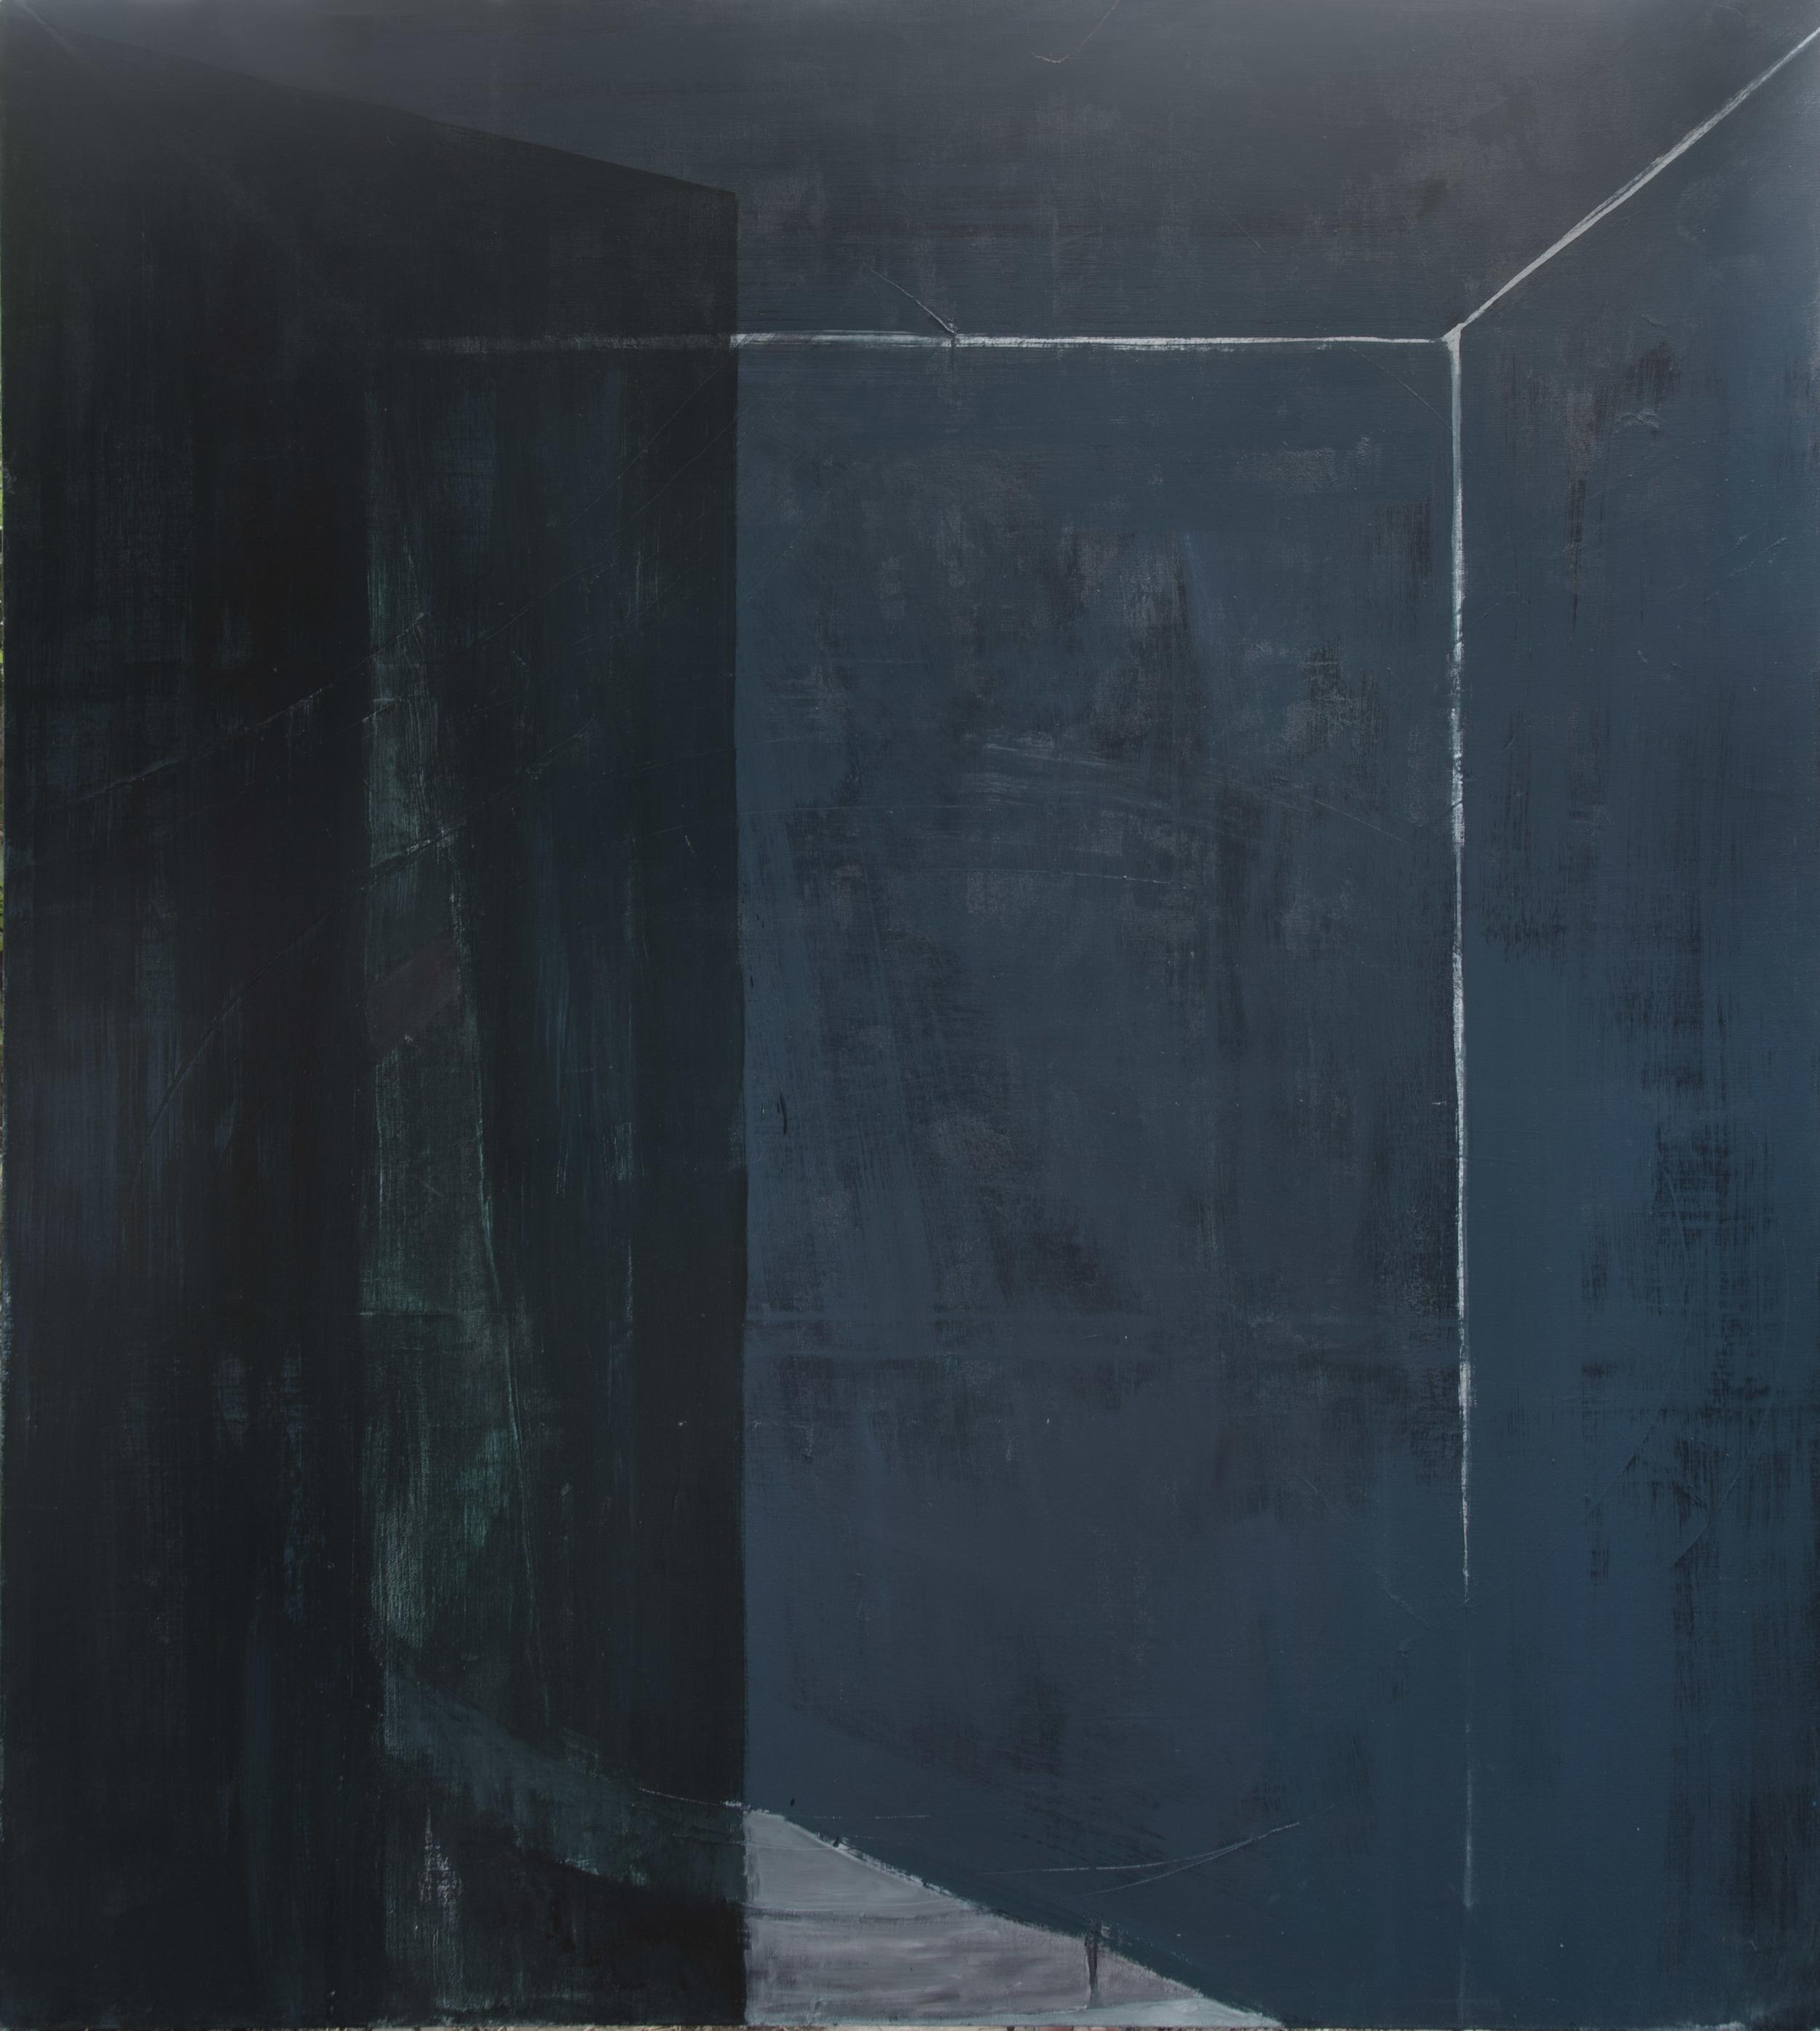 2015, 220x197cm, oil on canvas